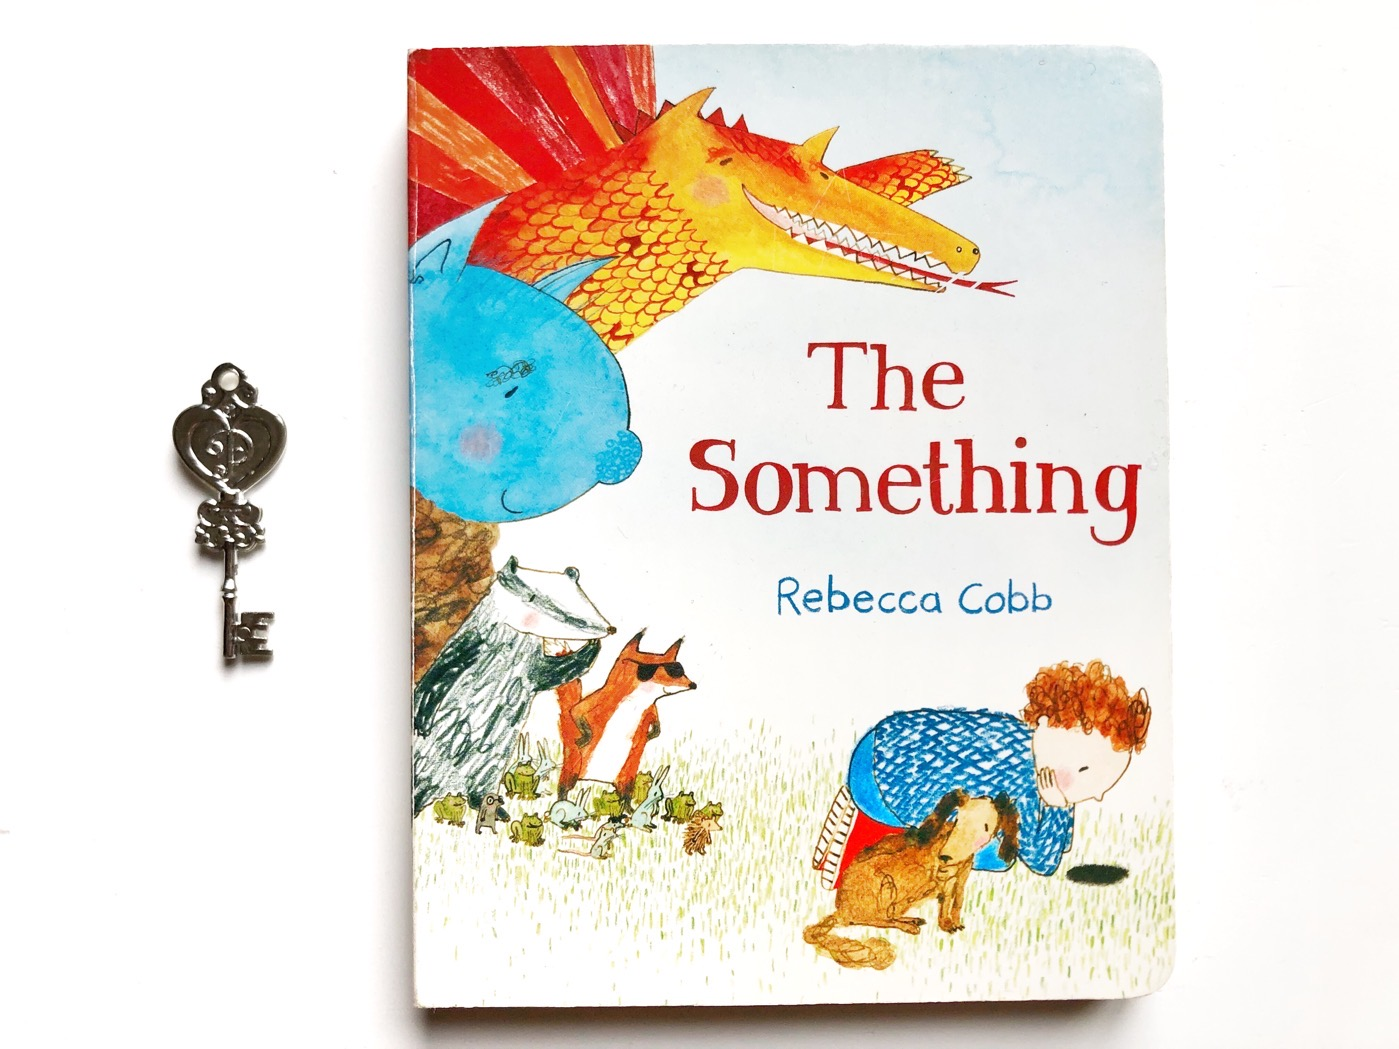 the-something-rebecca-cobb